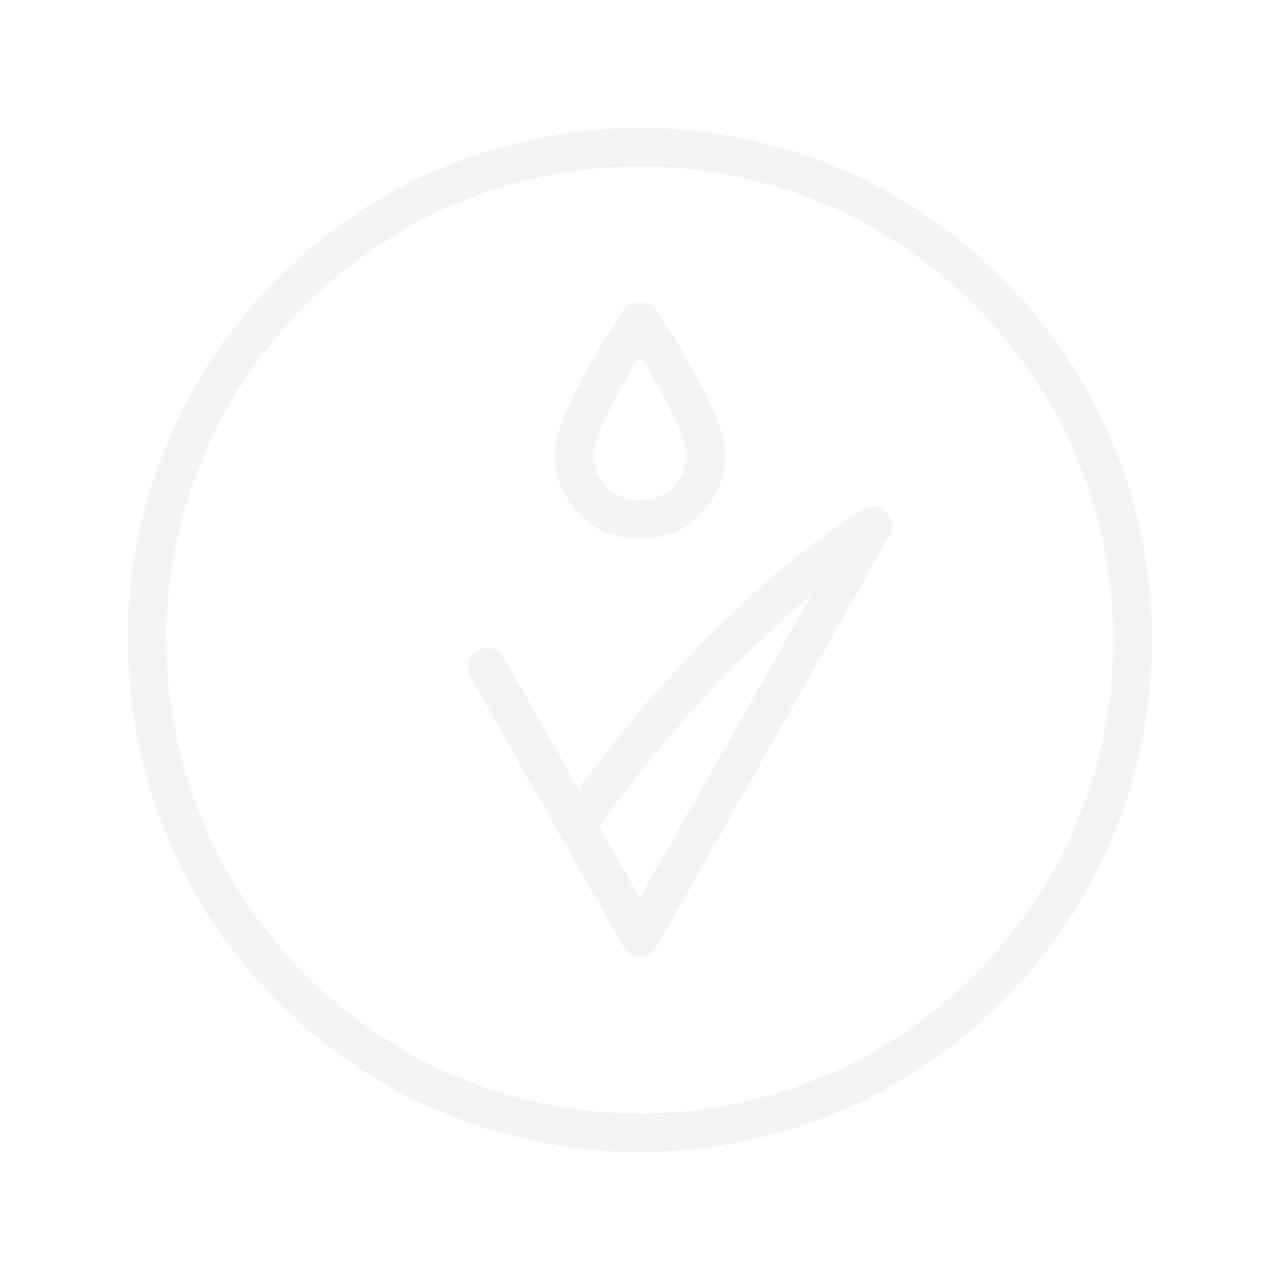 BIOKAP Nutricolor 7.0 Medium Blond Permanent Hair Dye 140ml